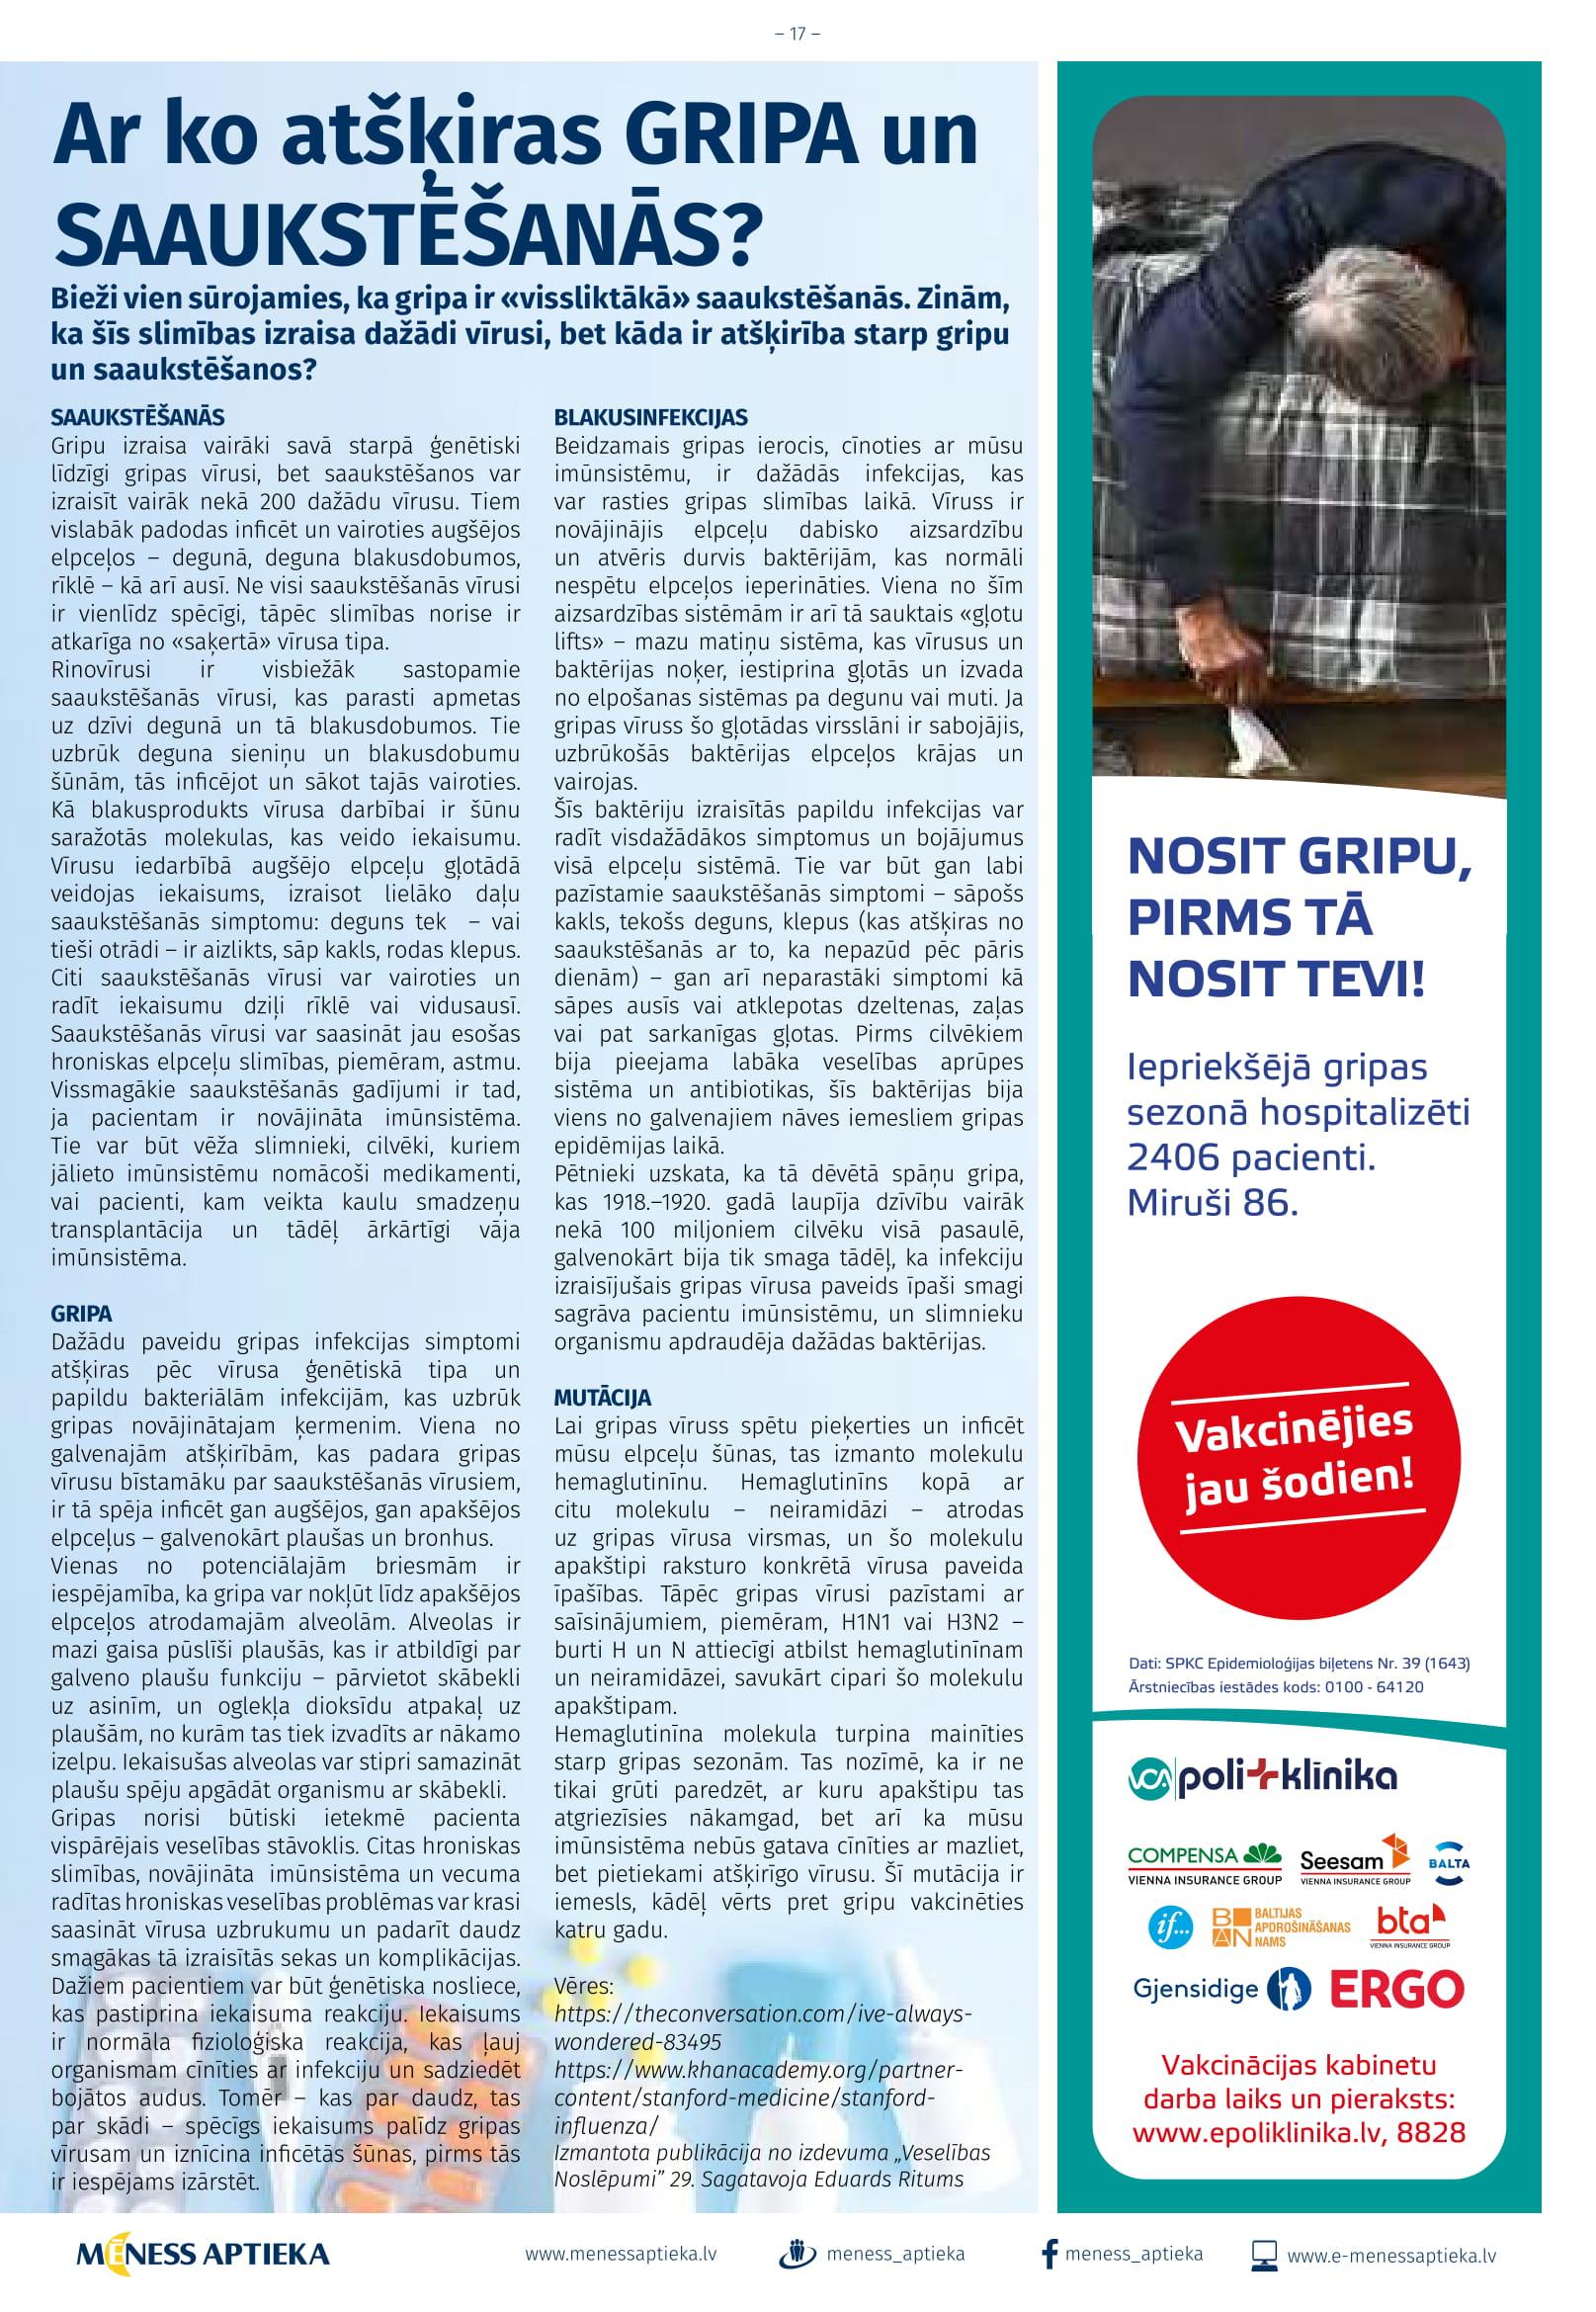 MĒNESS APTIEKA akcijas buklets 01.10.2019 - 31.10.2019